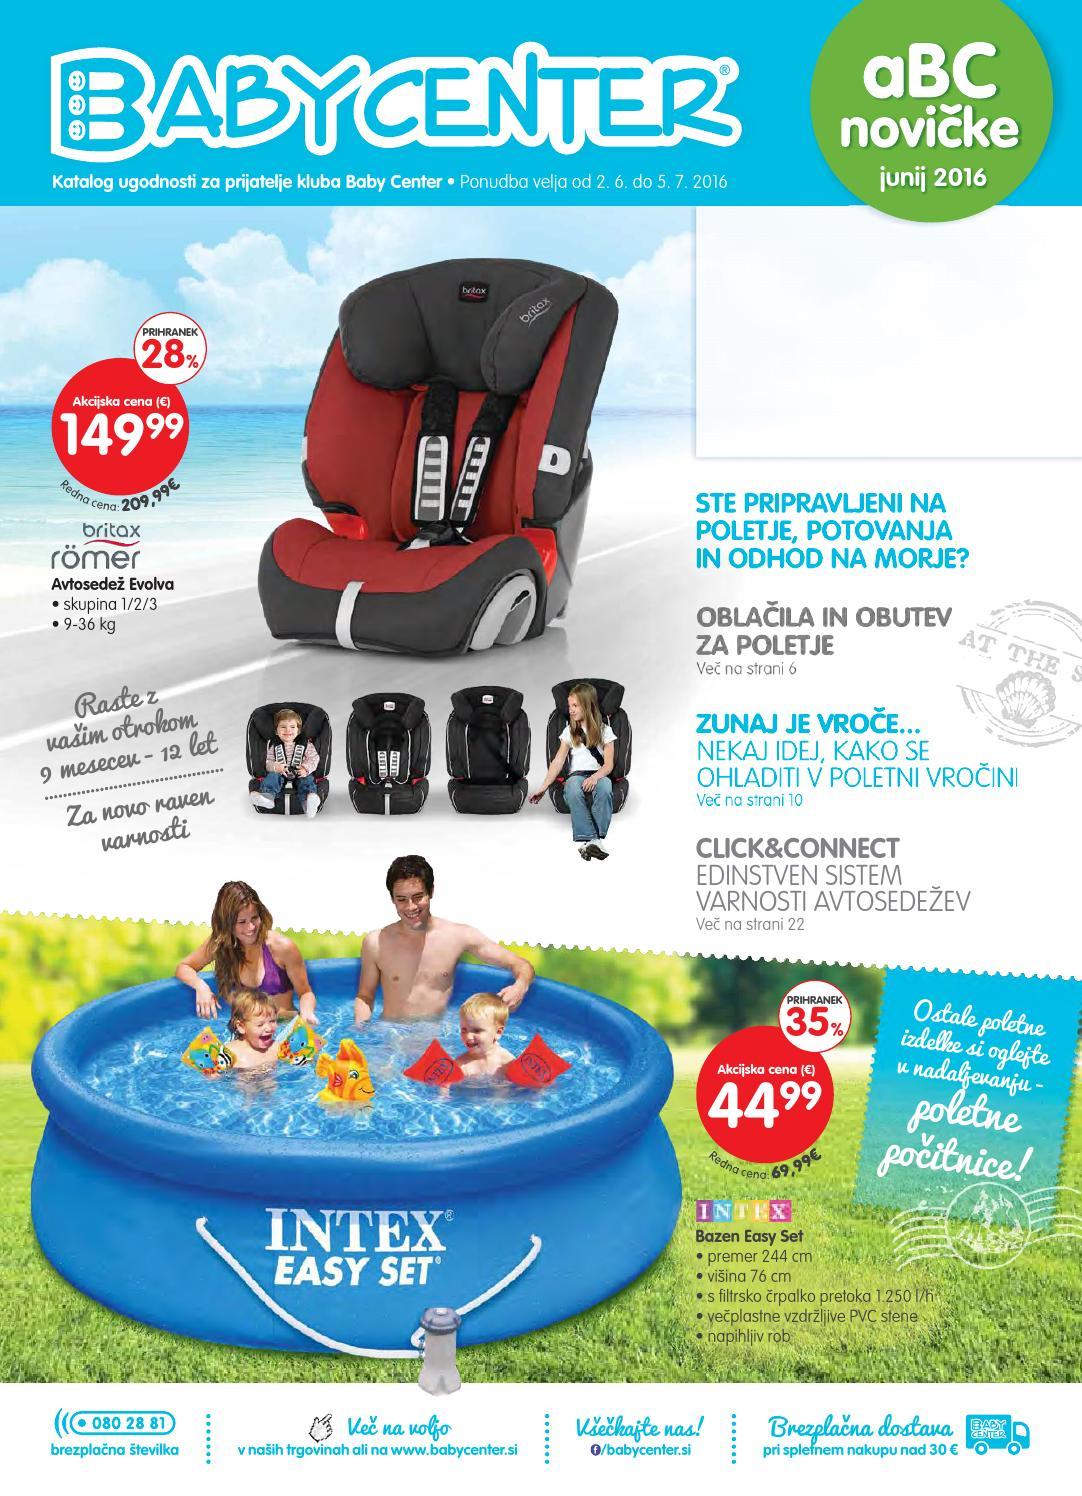 Baby Center - aBC novičke - junij 2016 by Baby Center d.o.o. - issuu